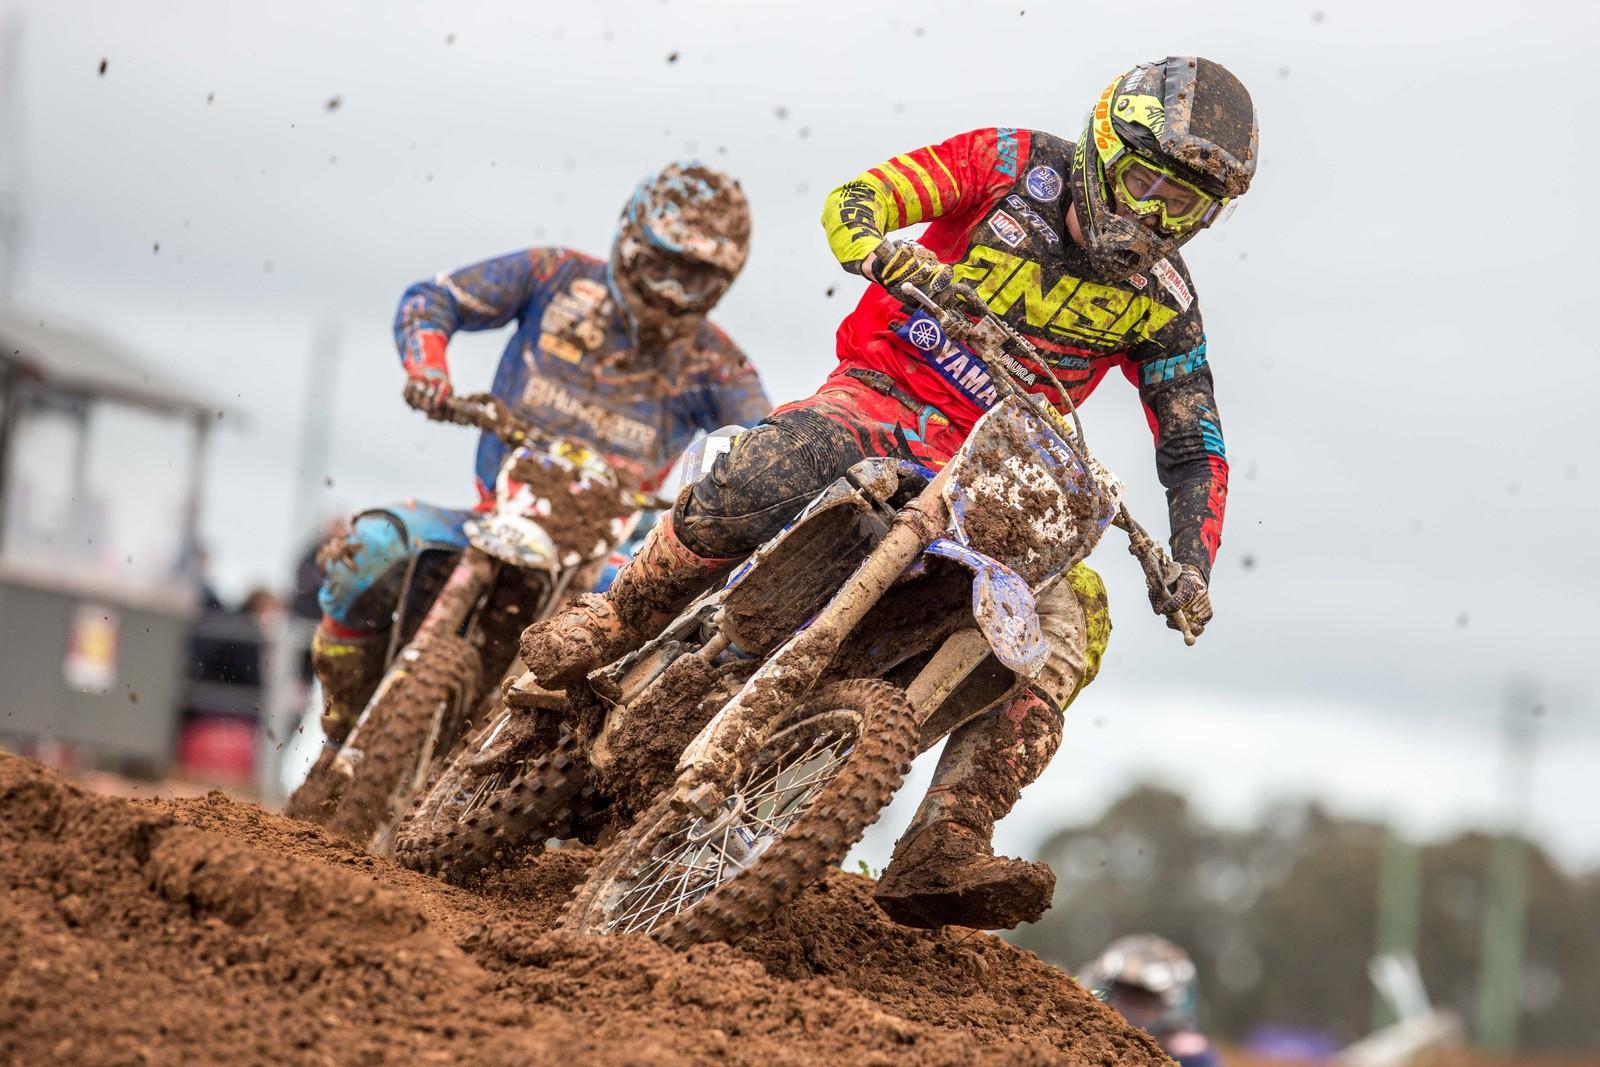 Wilson Todd - Australian Motul MX Championships: Round 8, Shepparton - Motocross Pictures - Vital MX